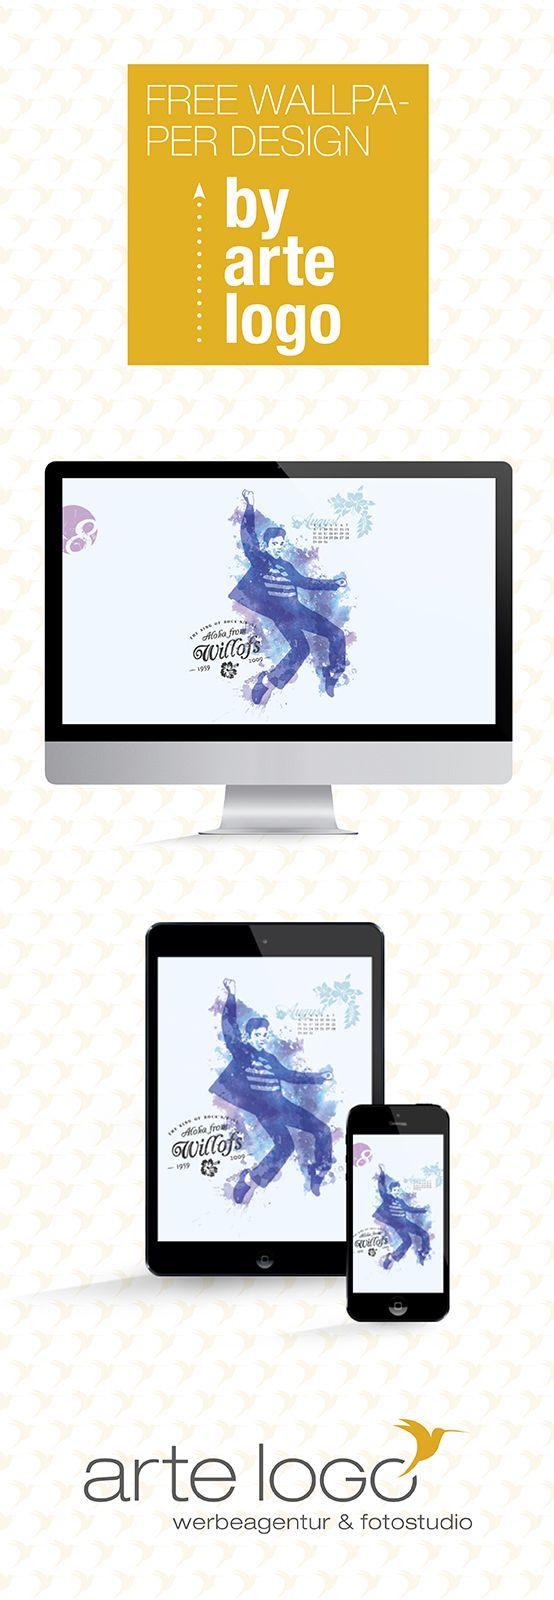 Free Wallpaper for Desktop, iPhone and iPad by arte-logo.de Free Download, Kalender 2016, selfmade, August, Aloha from Willofs, Elvis Presley, Gedenkstein, Vogelsbergkreis, Hessen